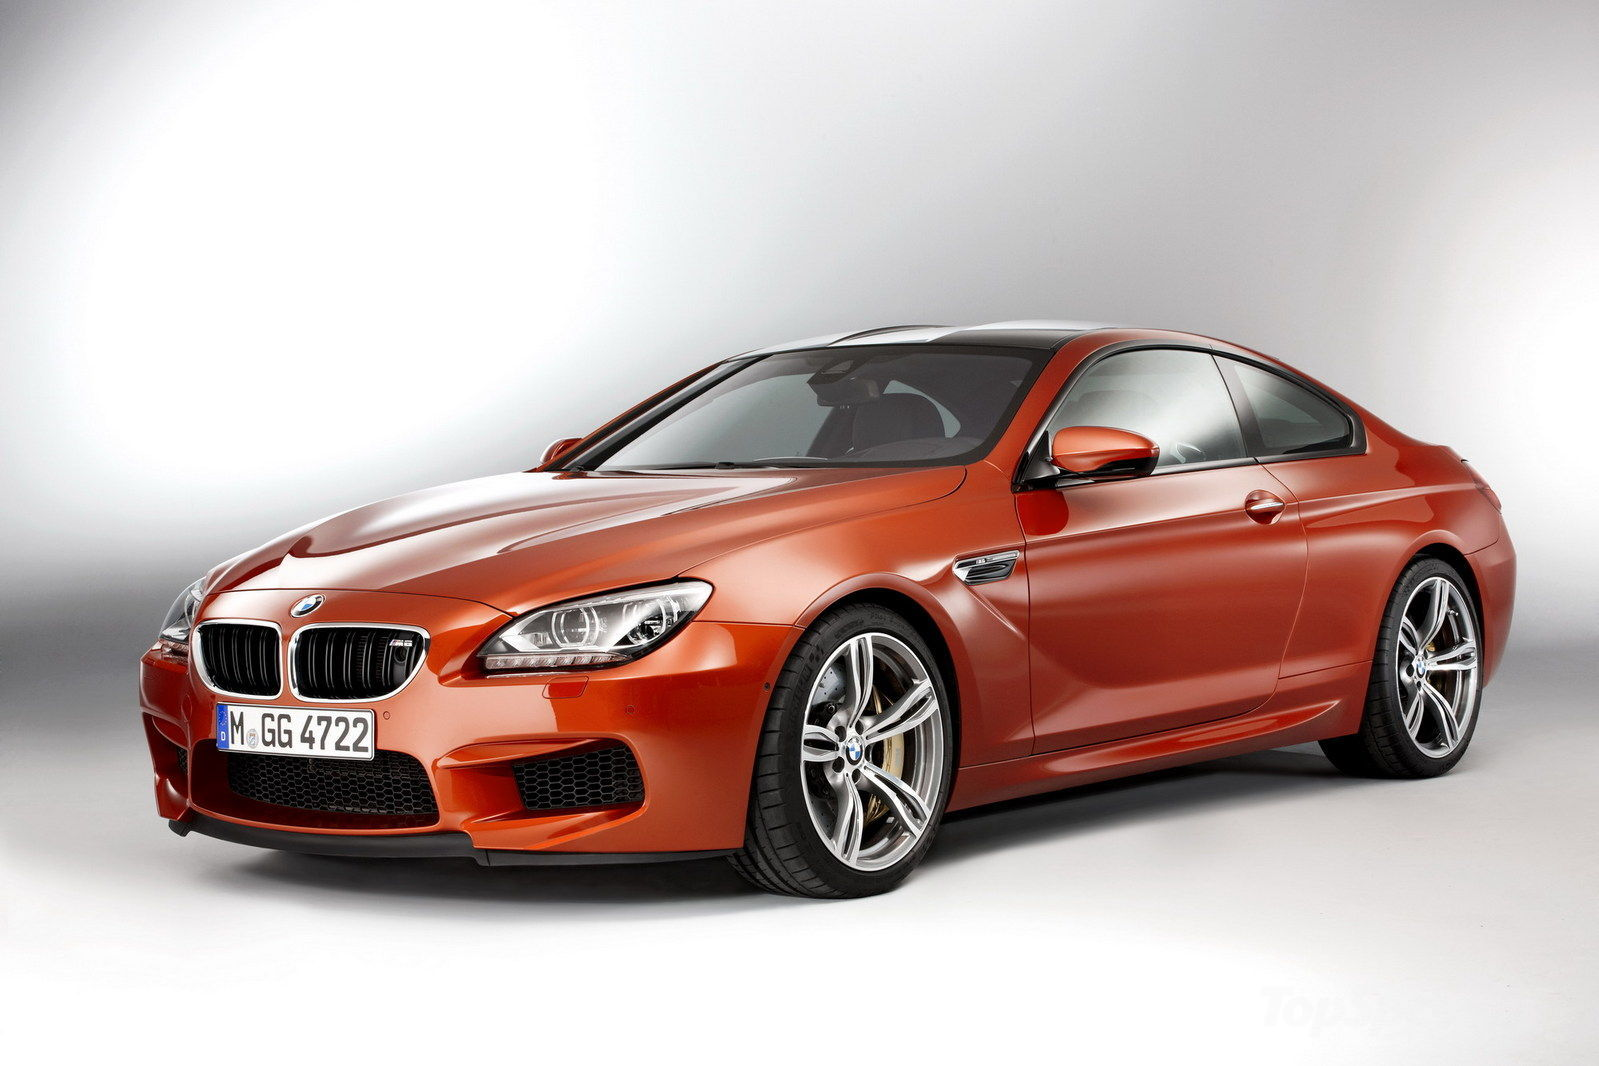 auto 2013 BMW M6 Coupe